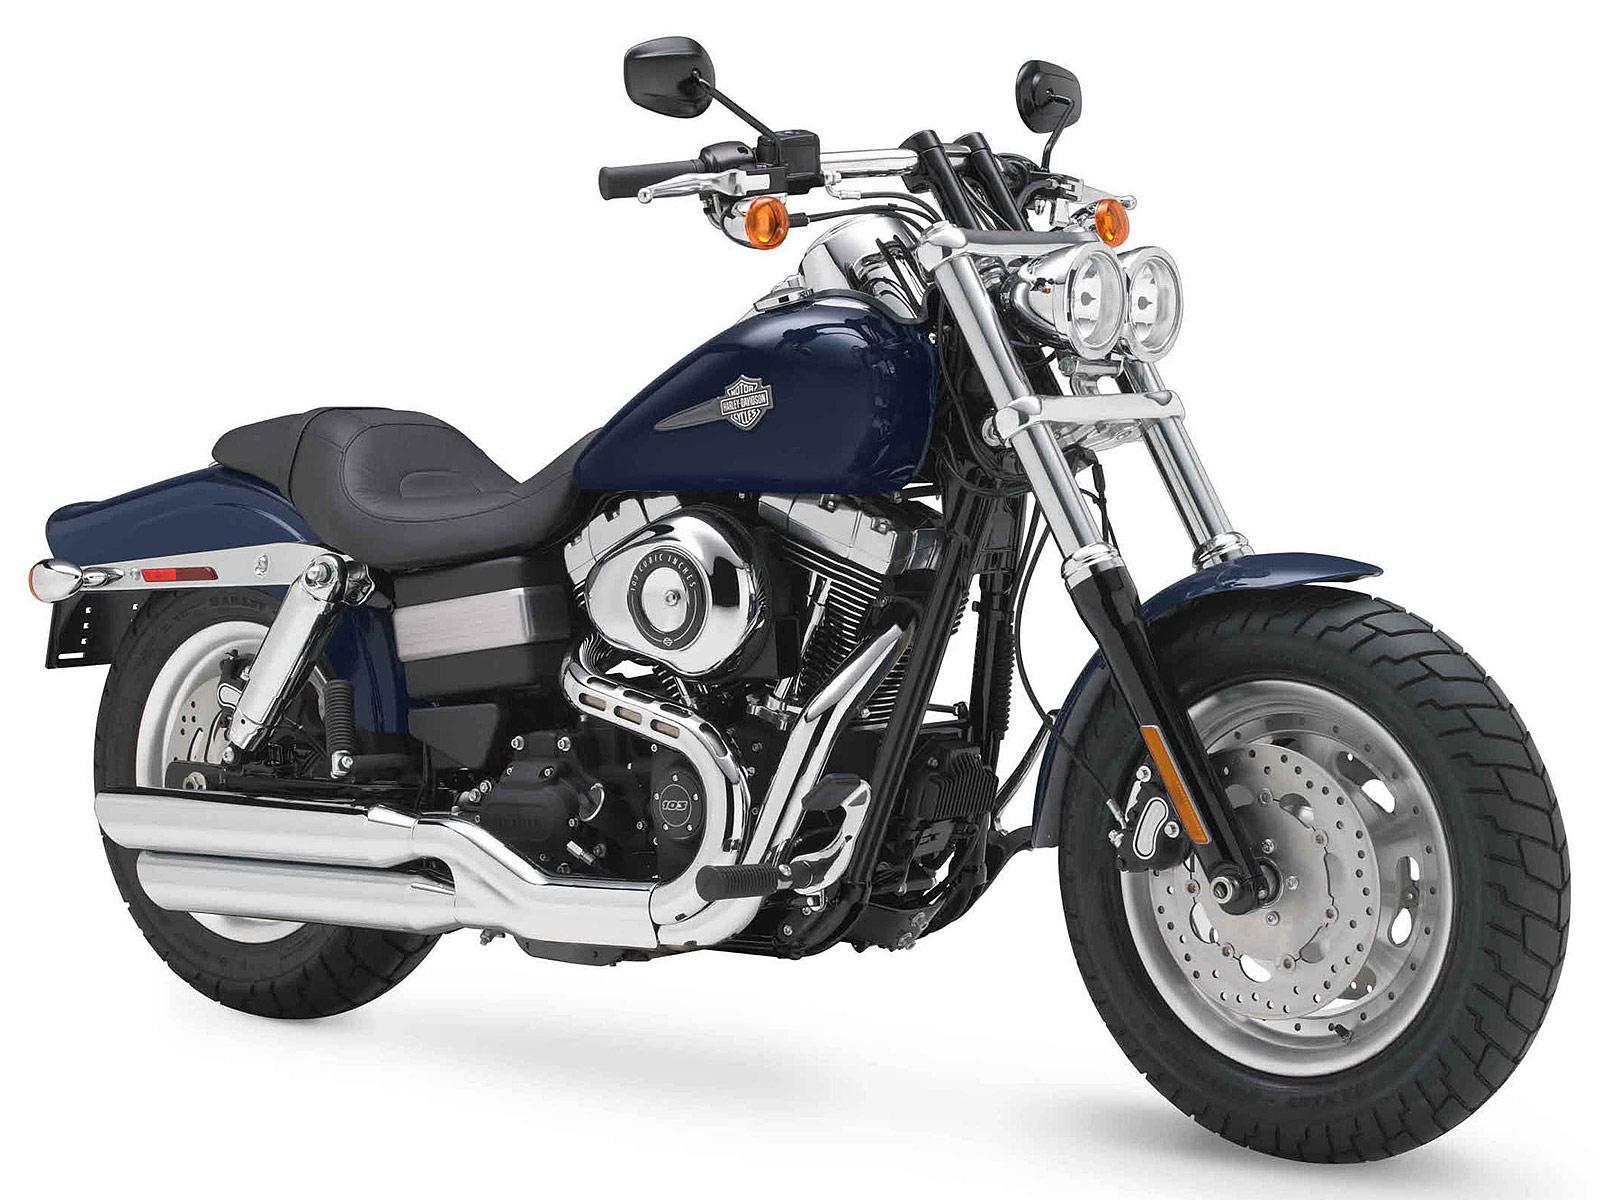 Engine Size Of Harley Davidson Fatboy